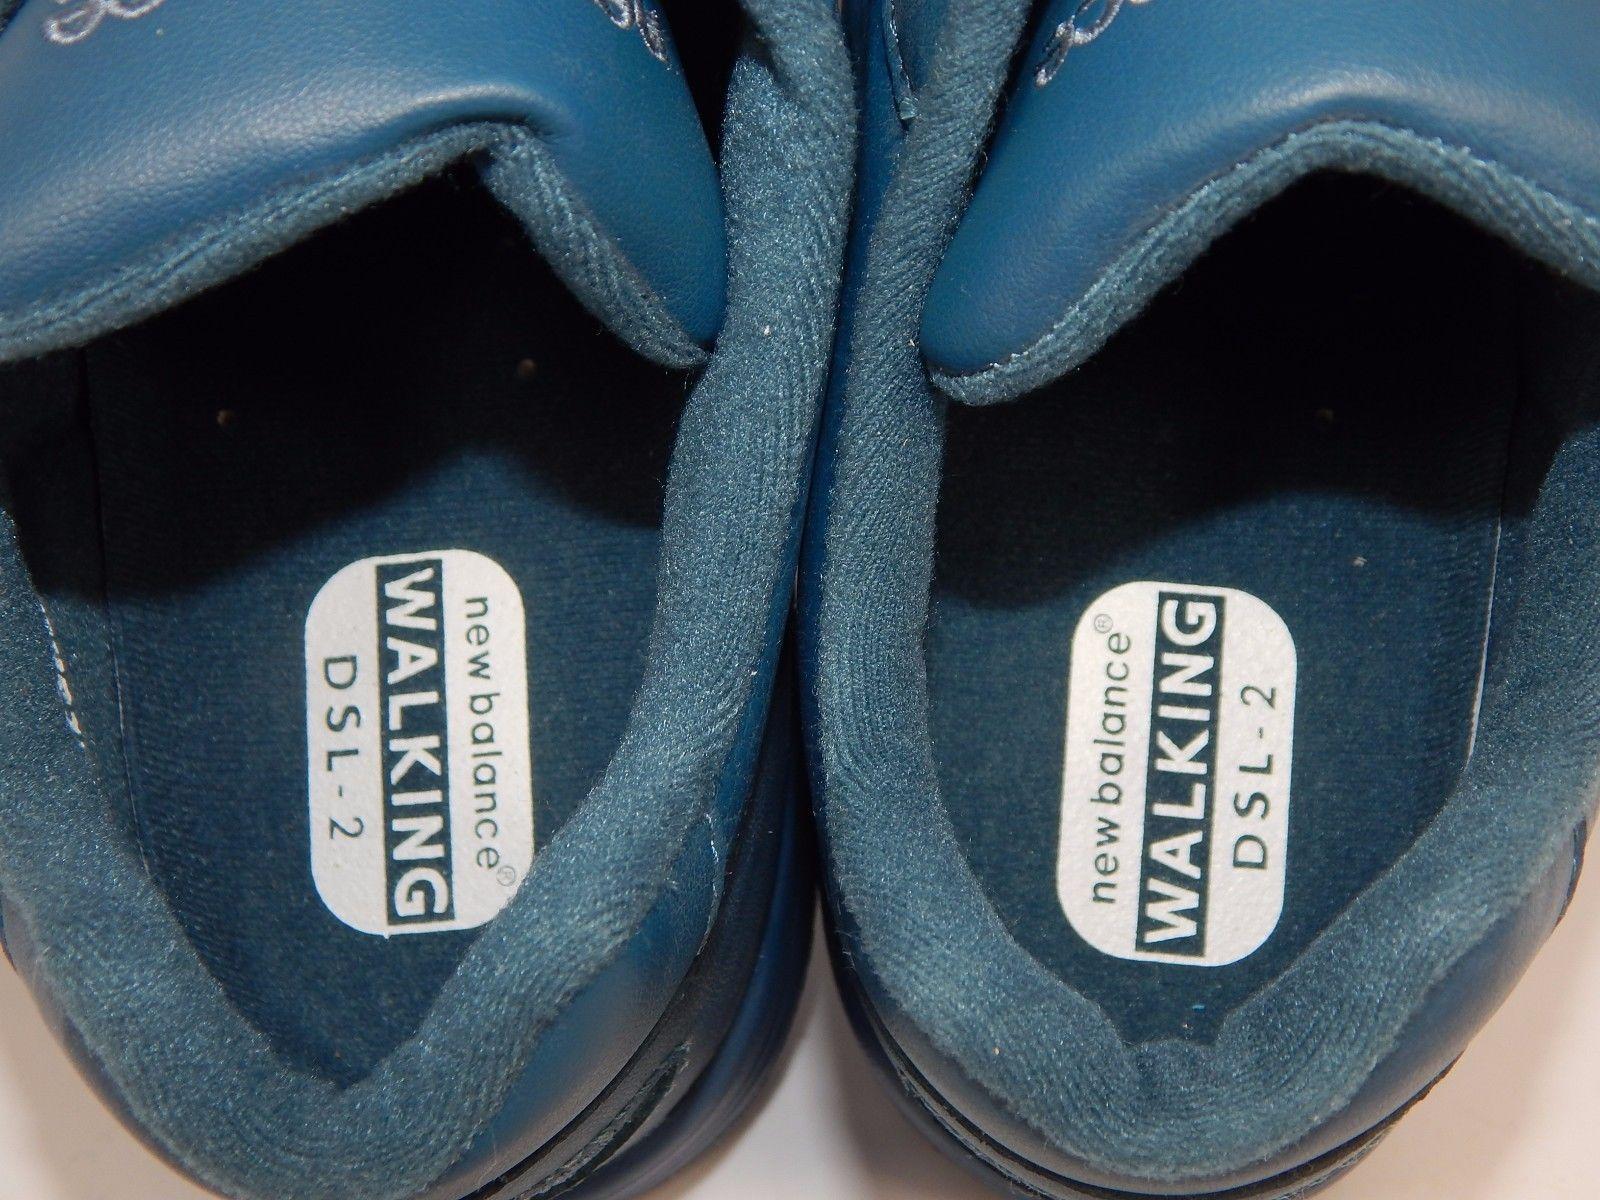 MISMATCH New Balance 811 Women's Shoes Size 8 4E Left & 8 2E Right EXTRA WIDE